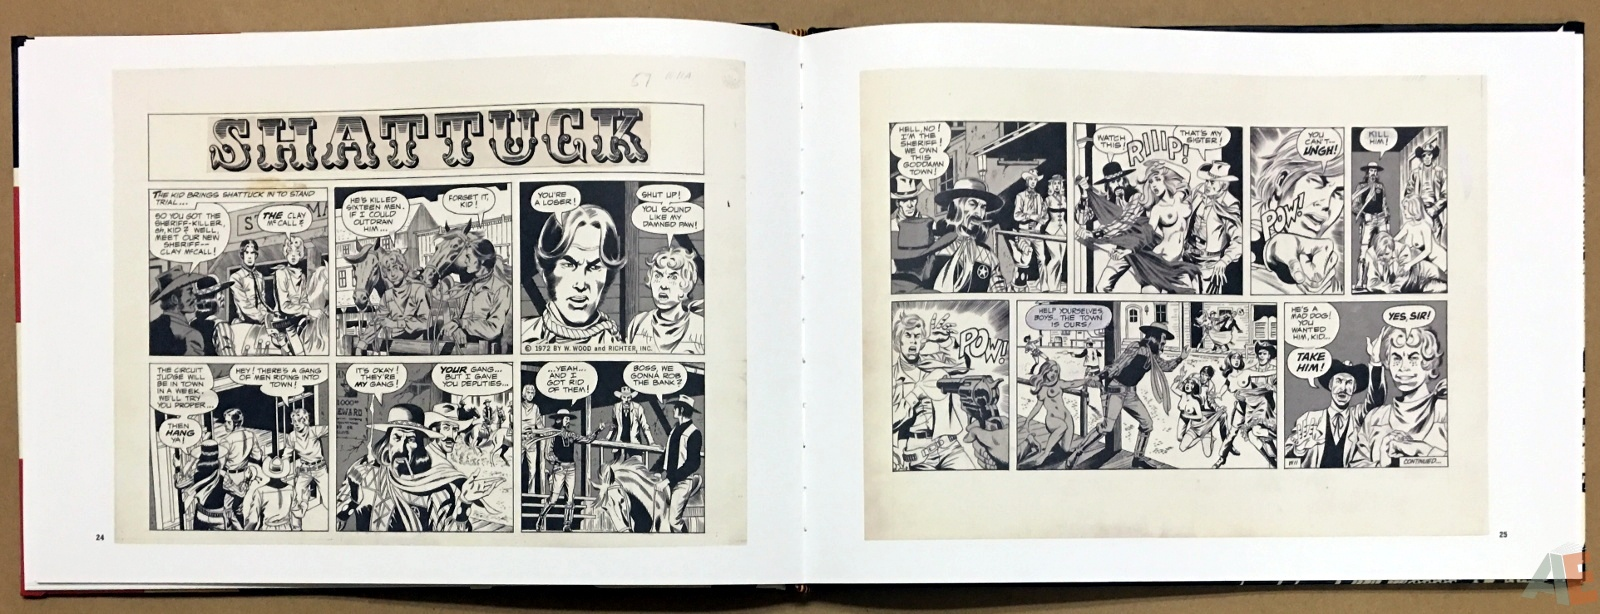 Wallace Wood Presents Shattuck Original Art Edition 14